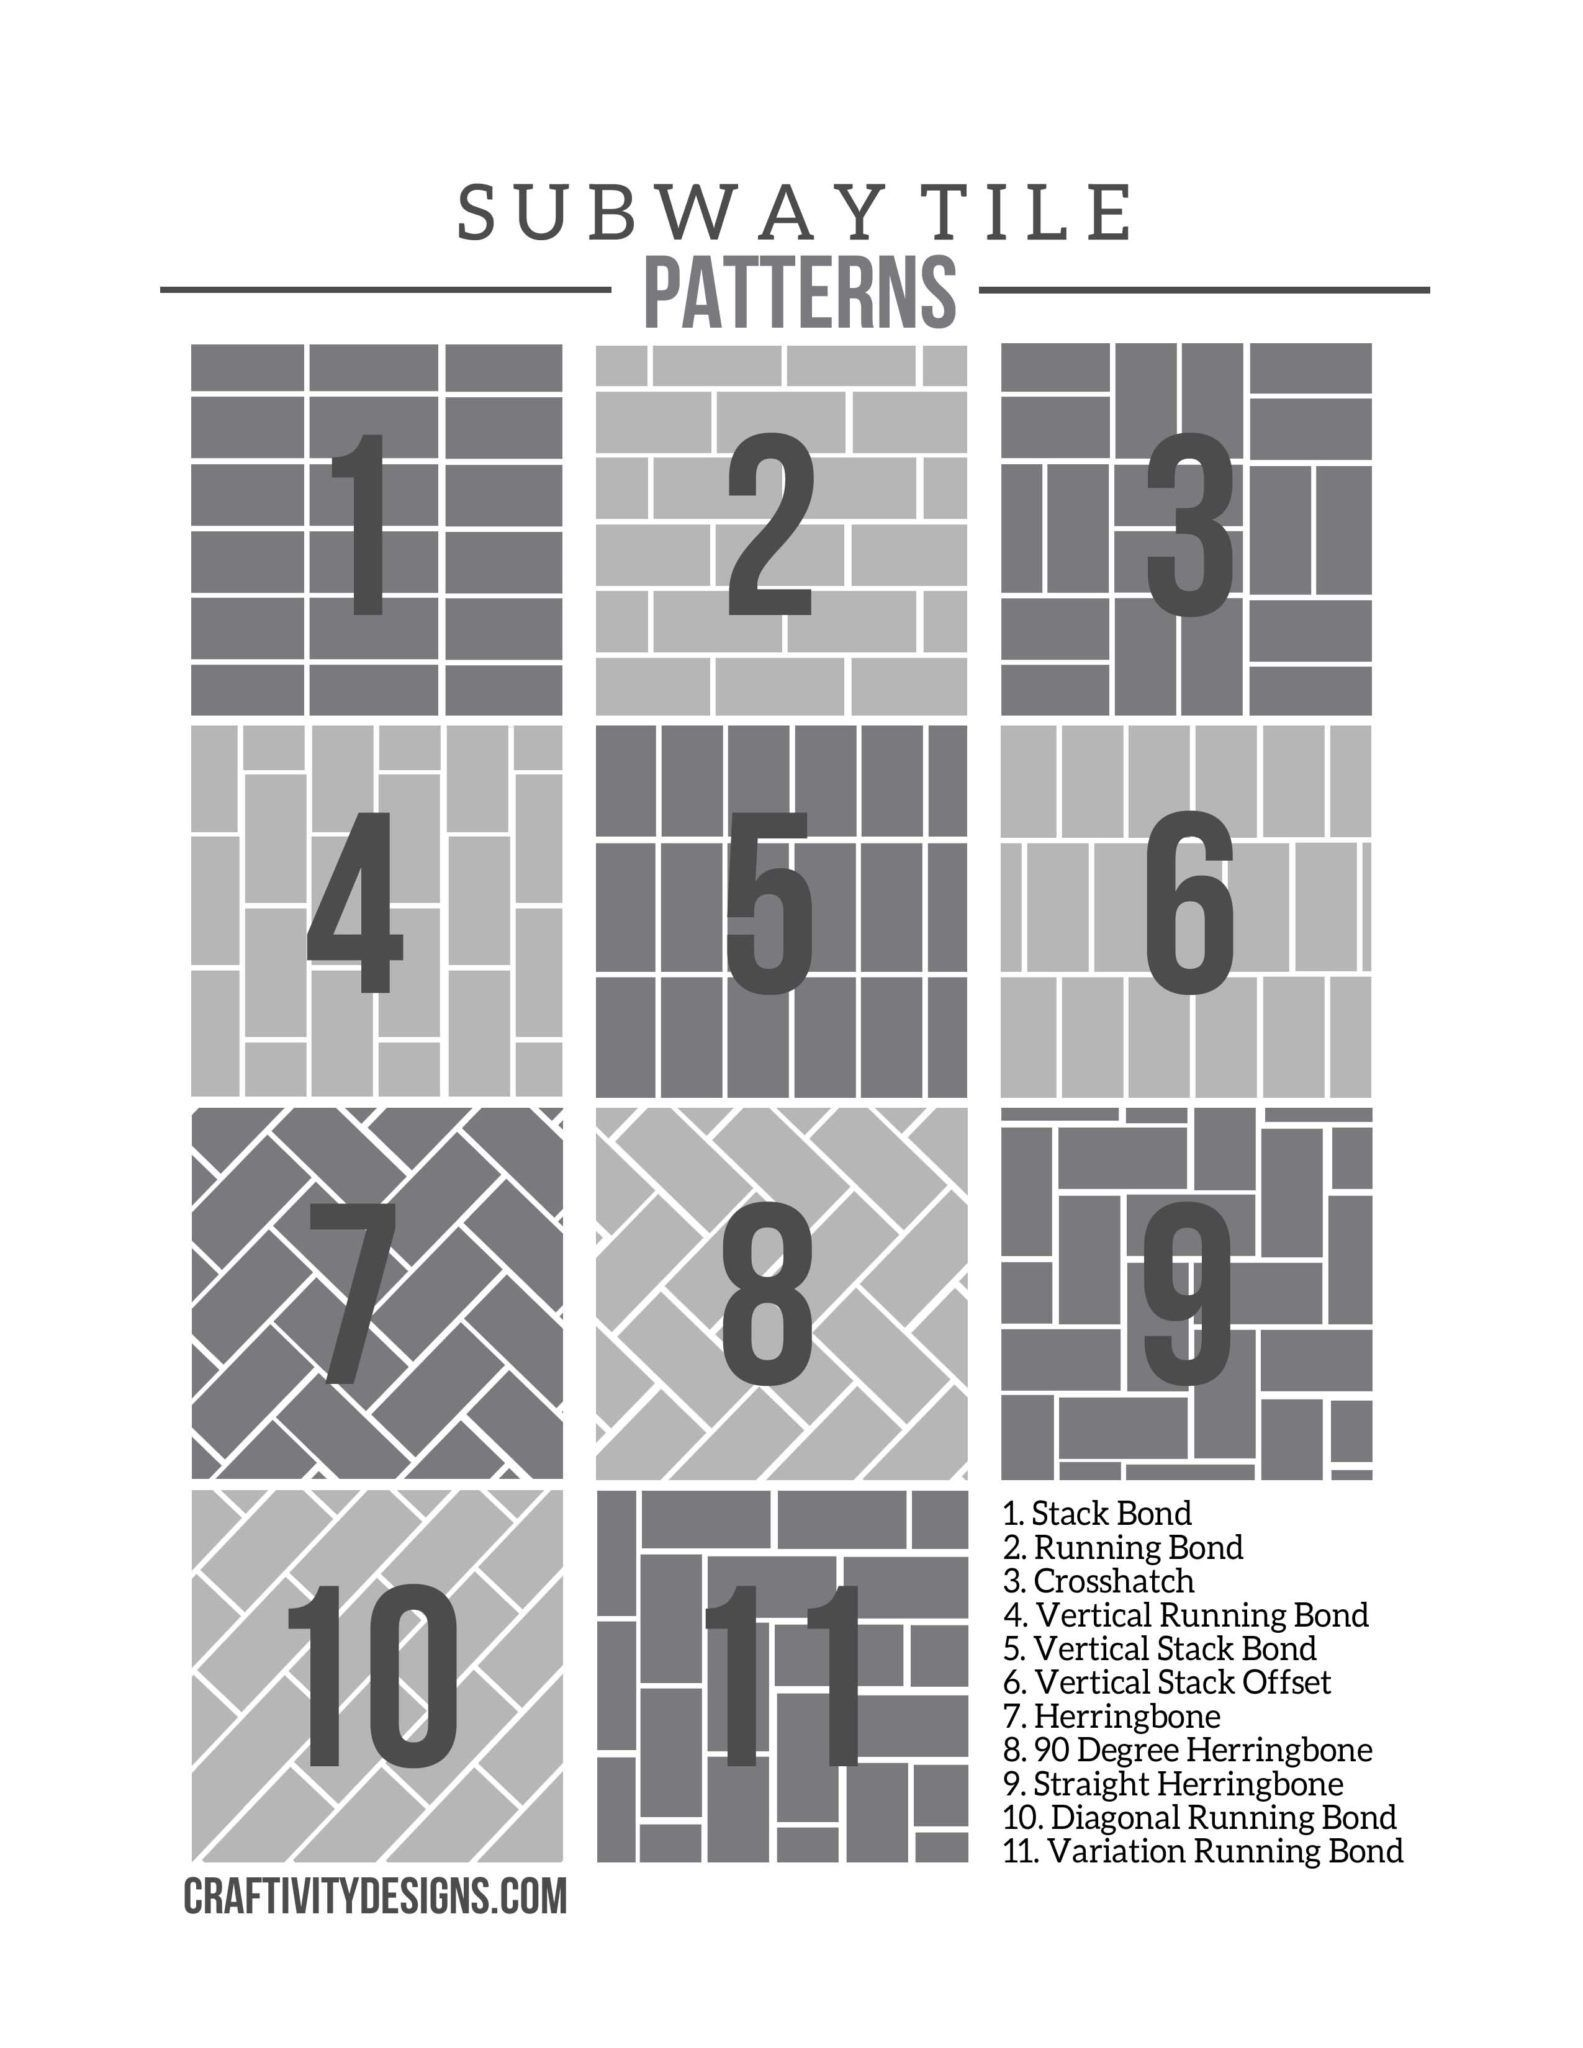 50 Subway Tile Ideas Free Tile Pattern Template Subway Tile